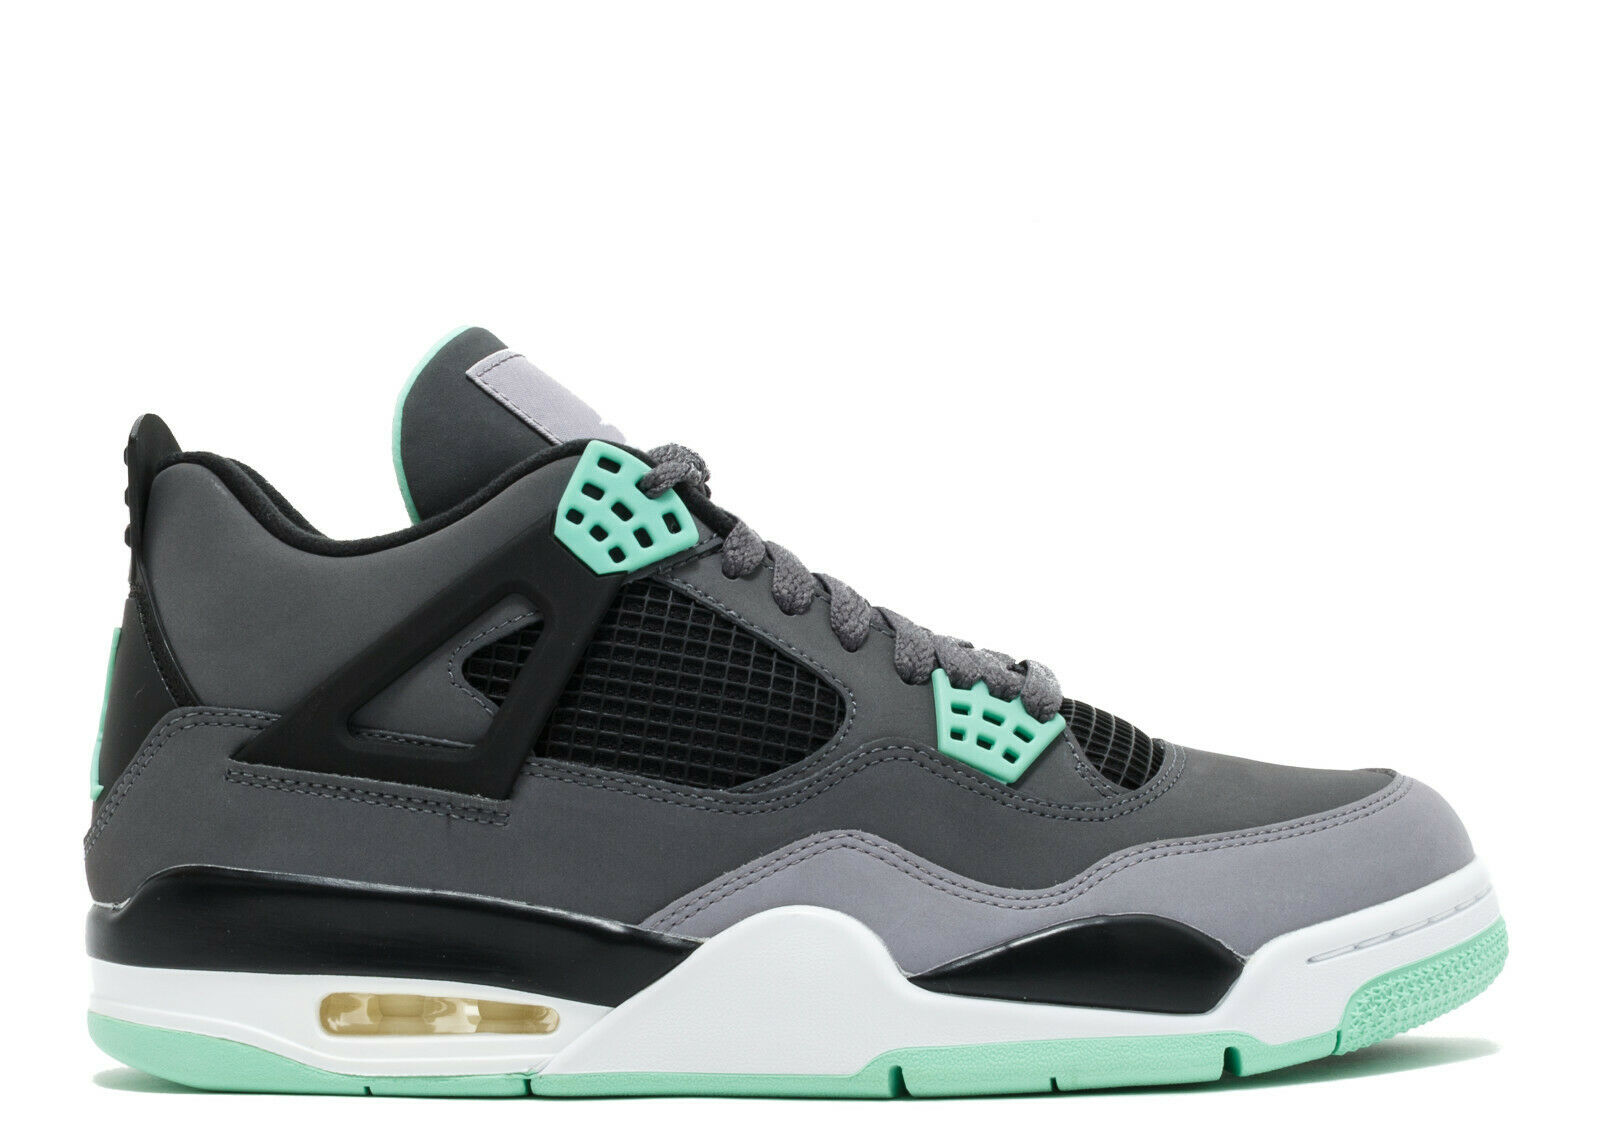 2013 Nike Air Jordan 4 IV Retro SZ 9 Green Glow OG Cement Grey 308497-033